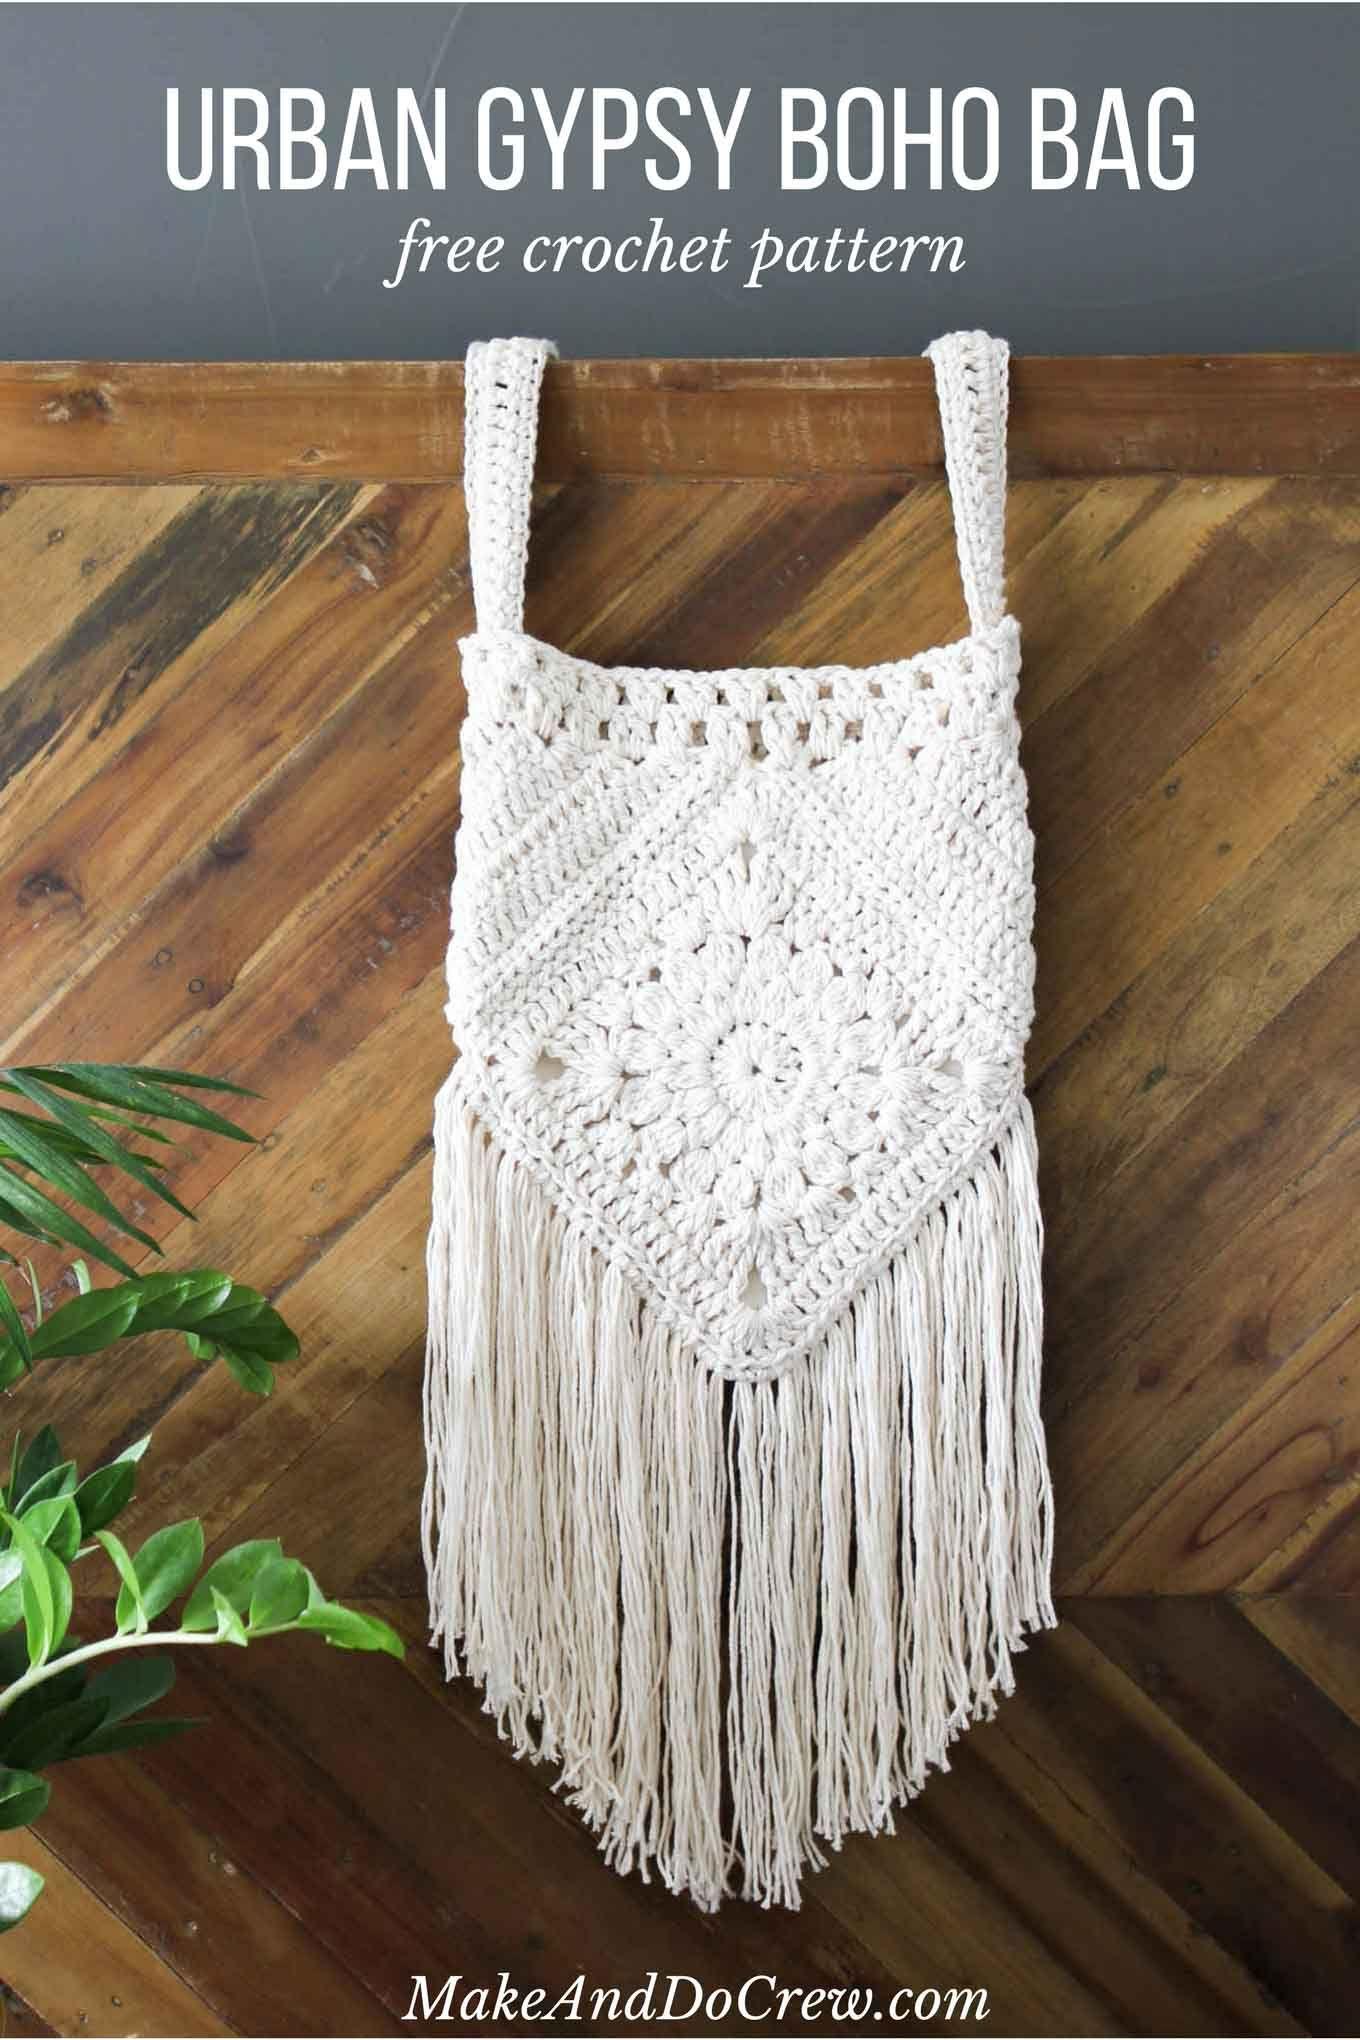 Urban Gypsy Boho Bag – Free Crochet Pattern | Pinterest | Lion brand ...